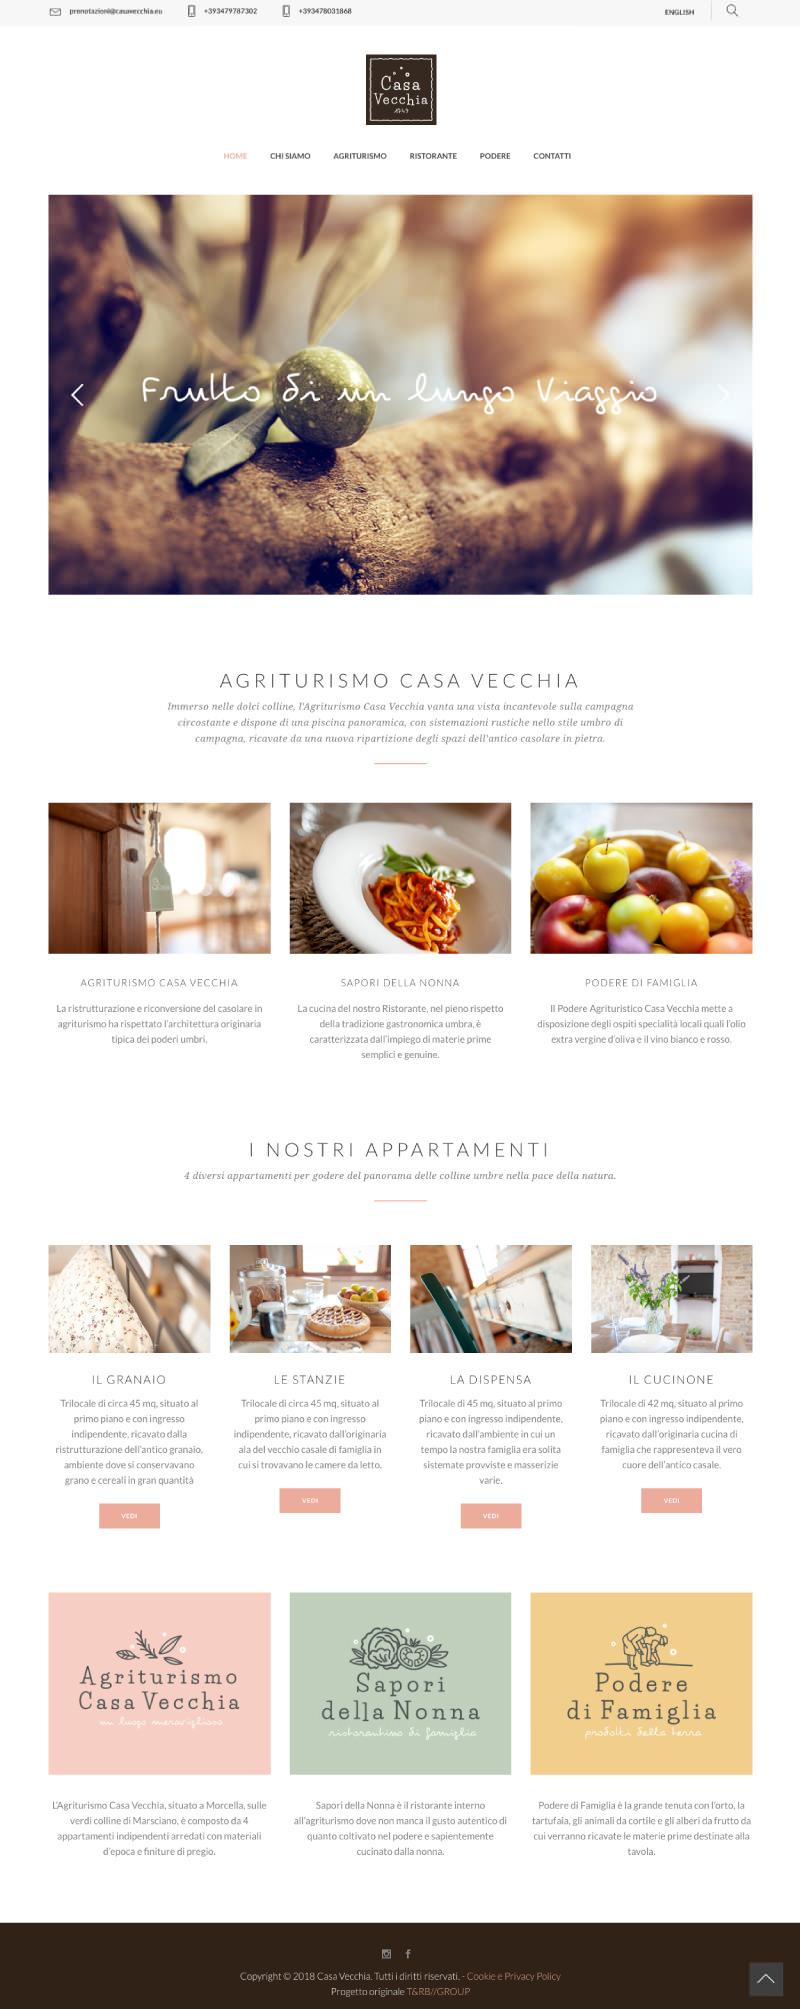 Pagina-Casa-Vecchia_05.jpg